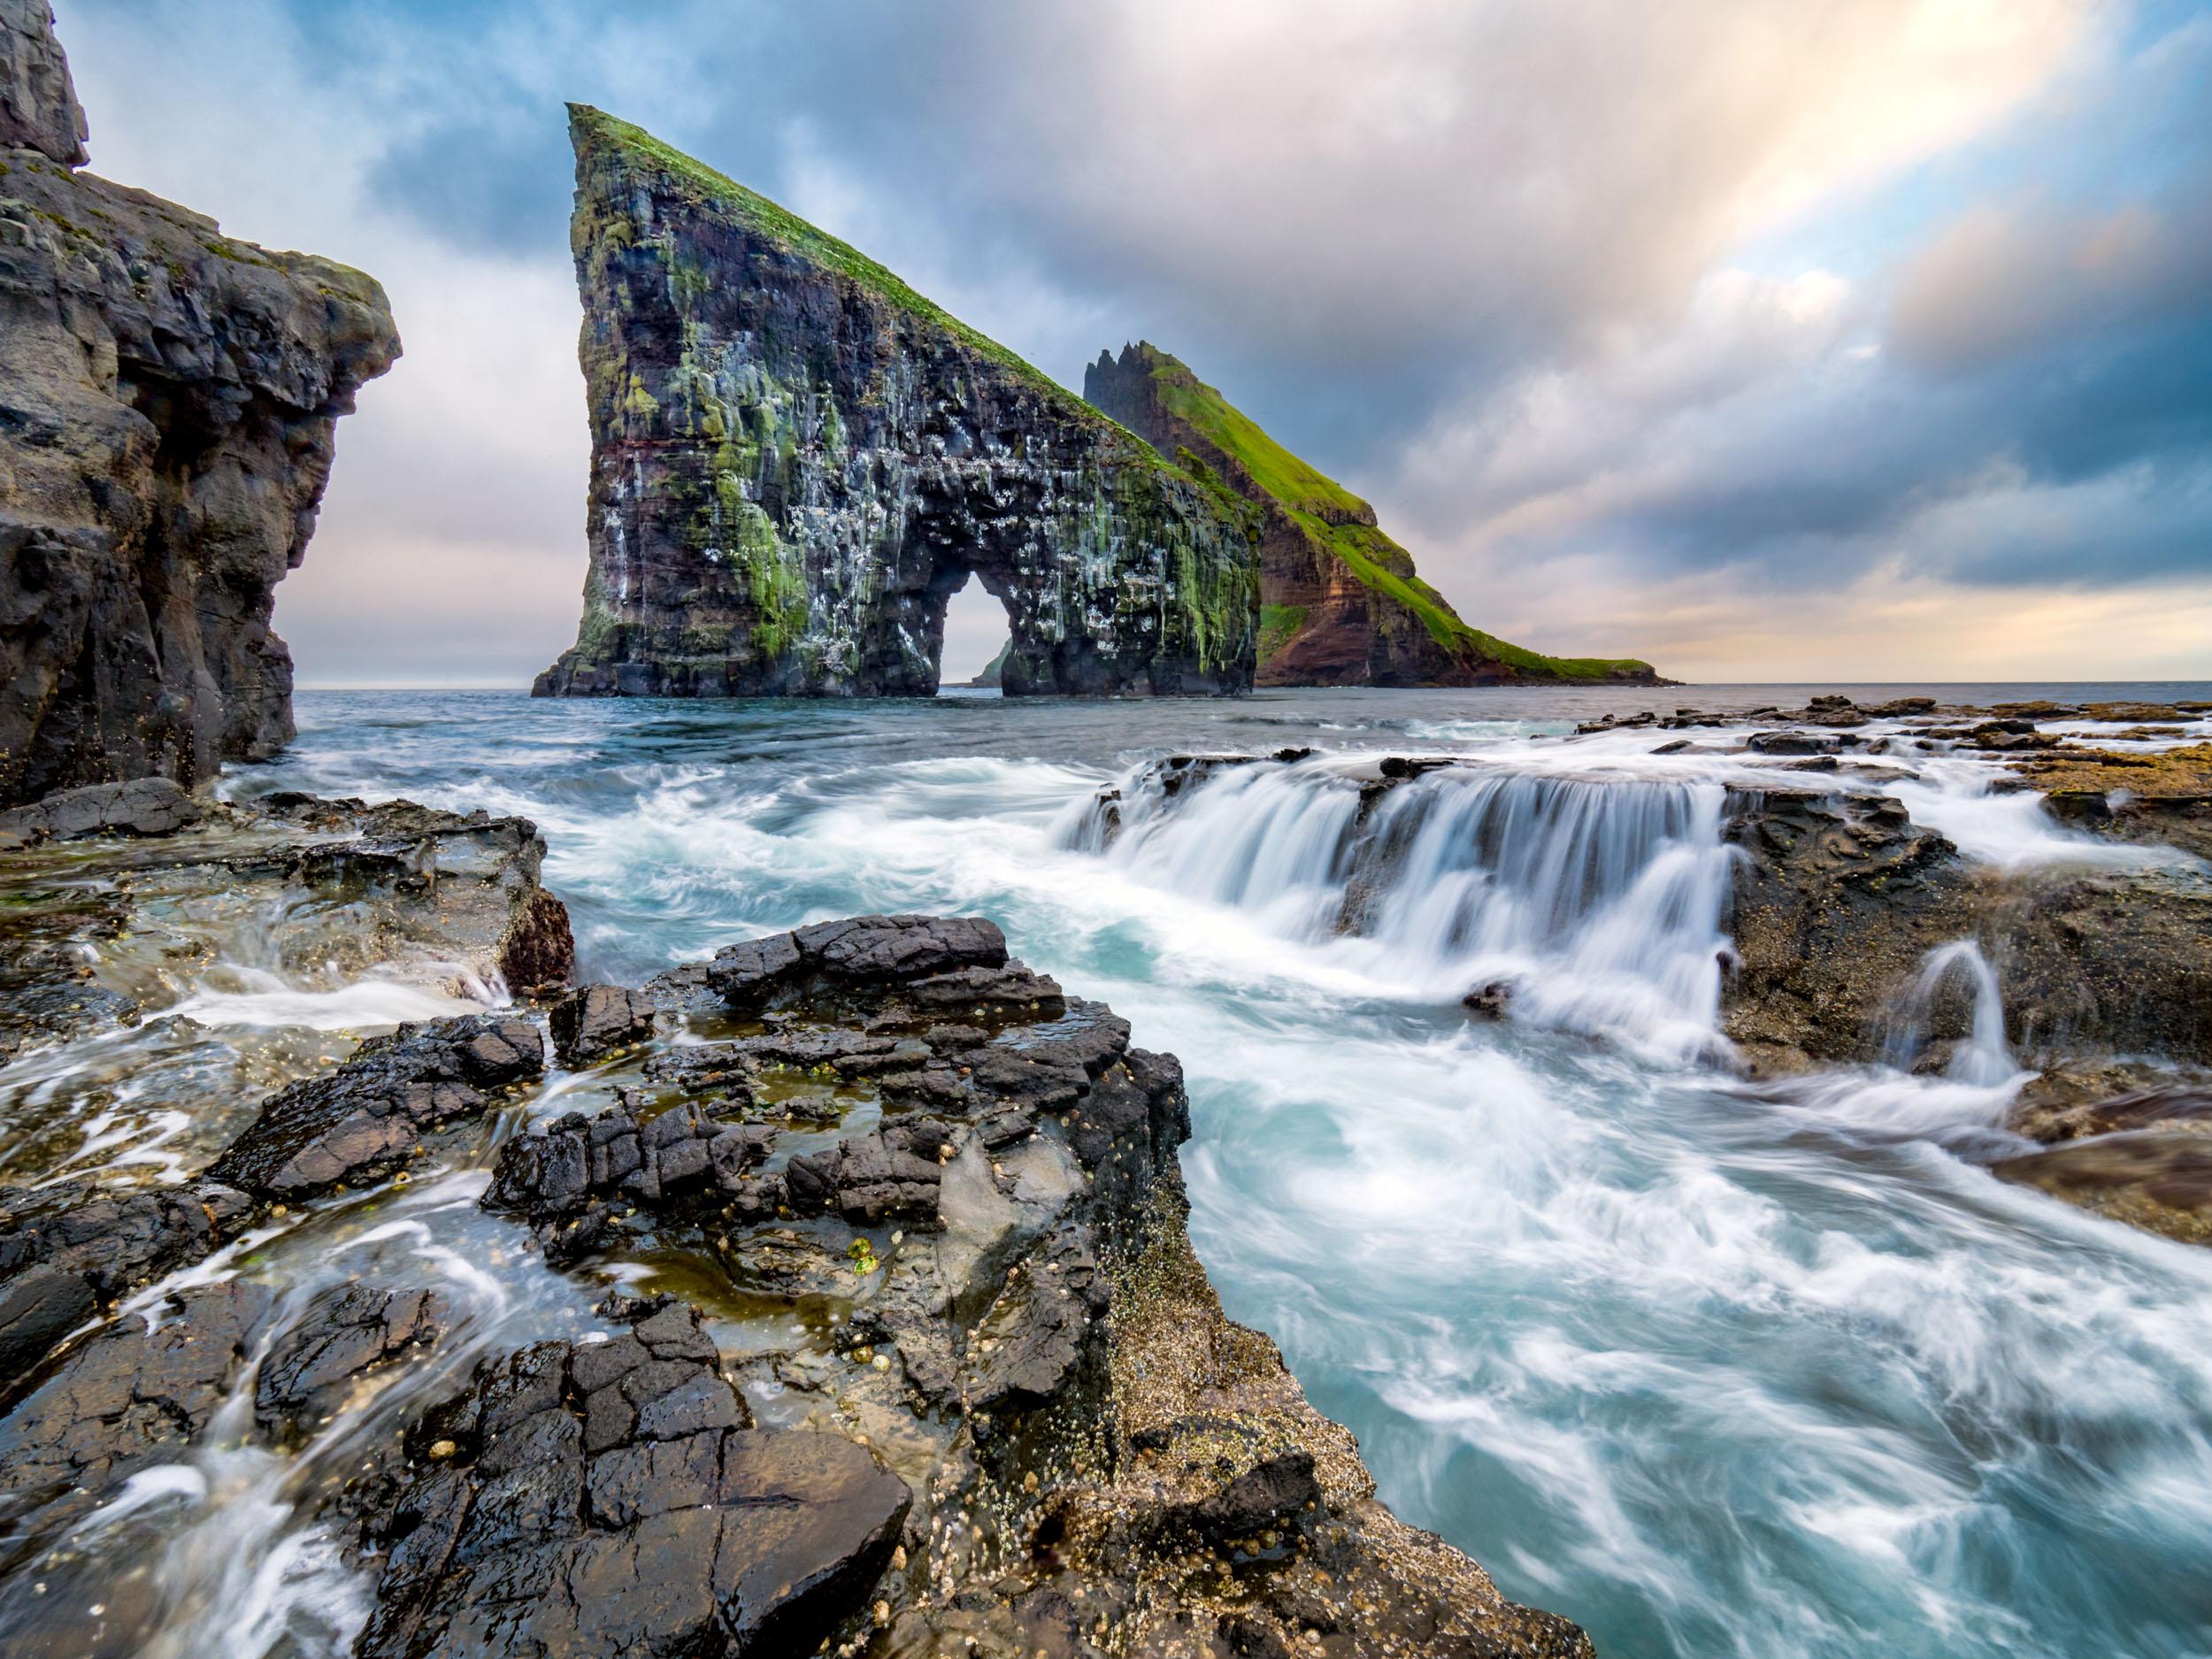 Landscapes - Inspiring scenery…